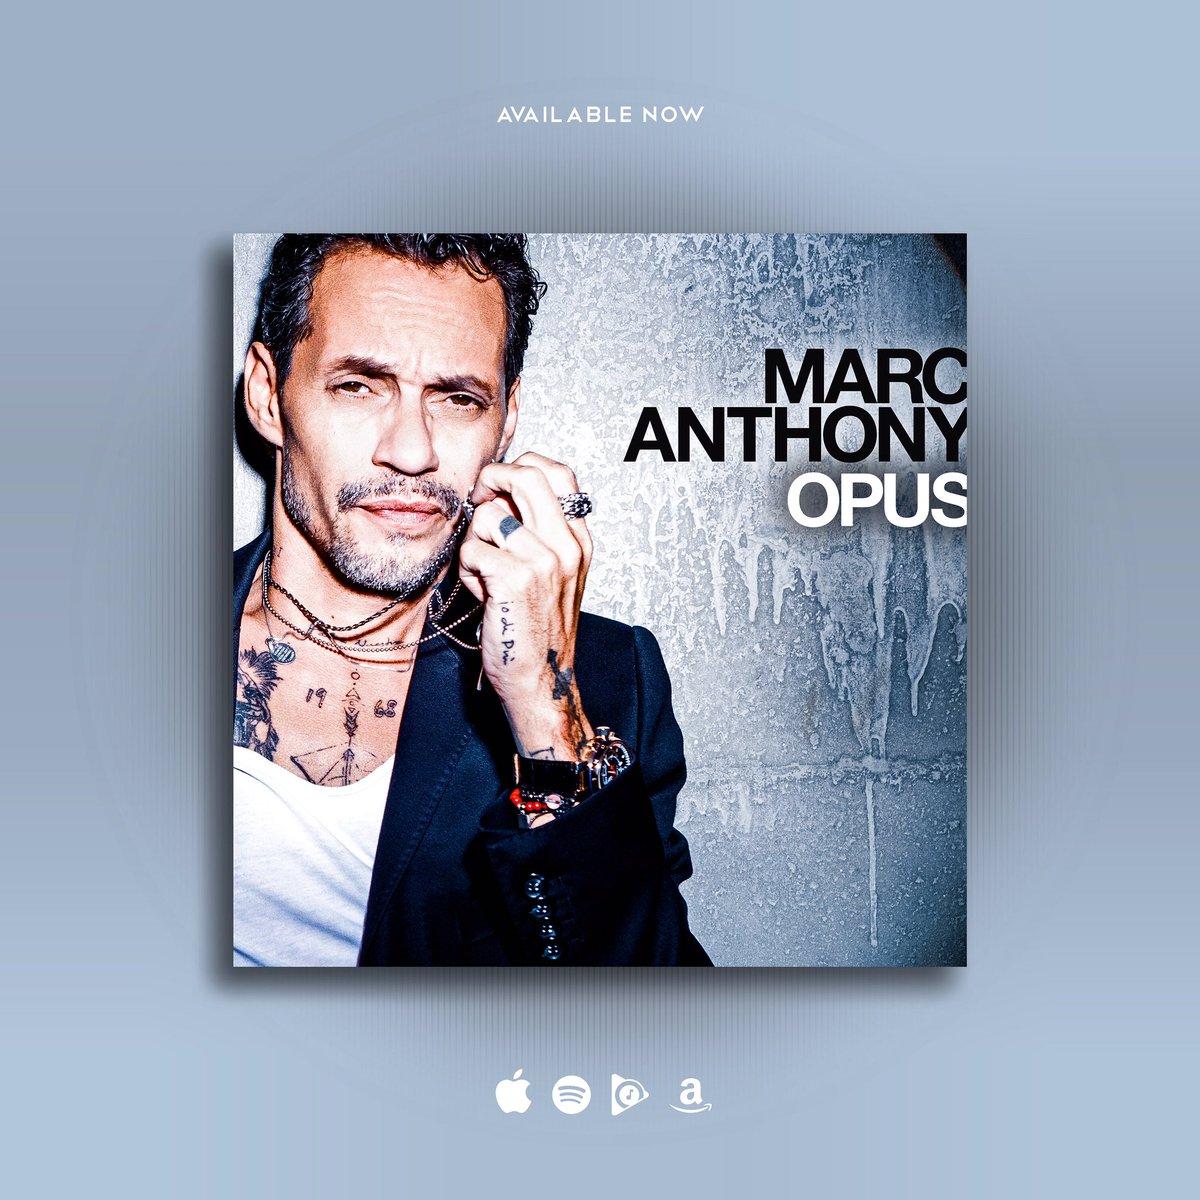 ¡La espera valió la pena! Ya esta disponible mi nuevo álbum #OPUS en todas las plataformas. ???????????????????????????? https://t.co/VAPQgYI5g3